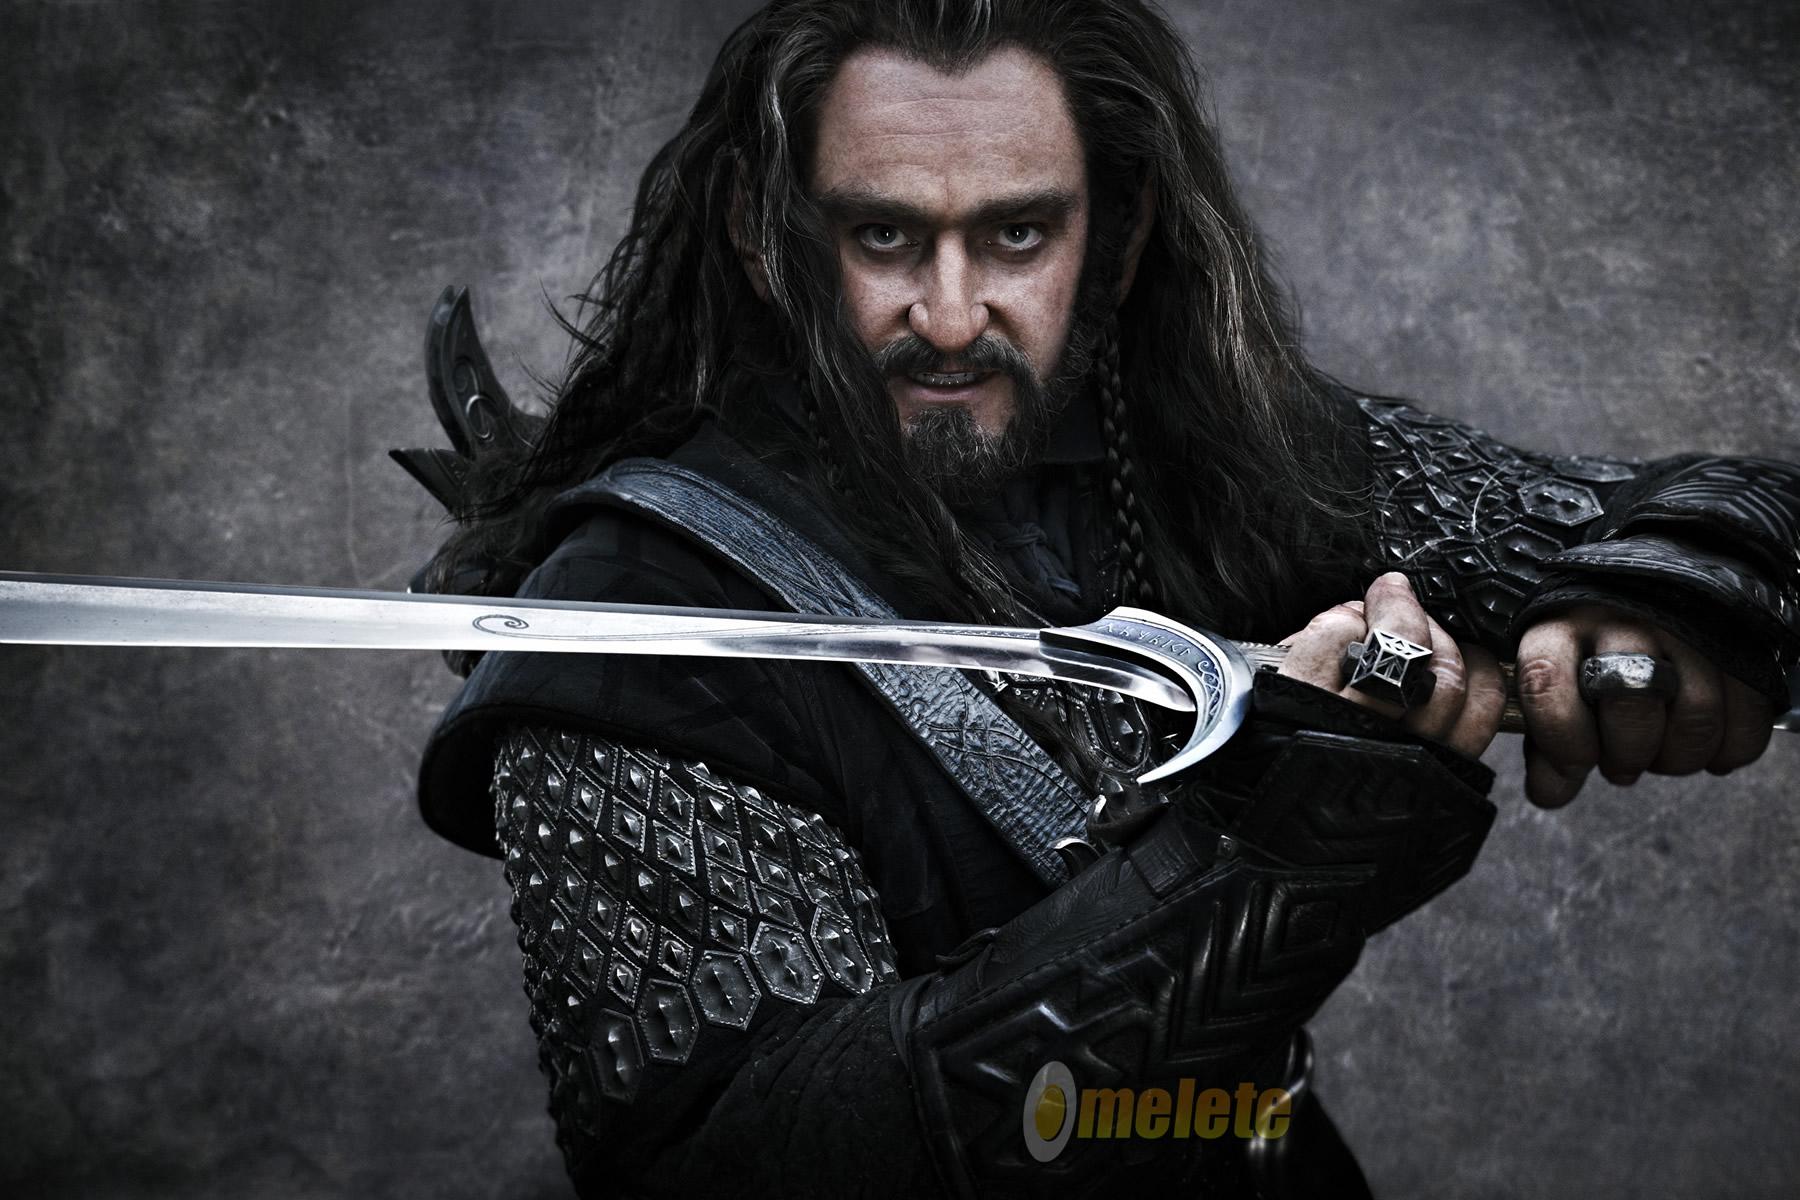 http://collider.com/wp-content/uploads/thorin-oakenshield-the-hobbit-movie-image.jpg